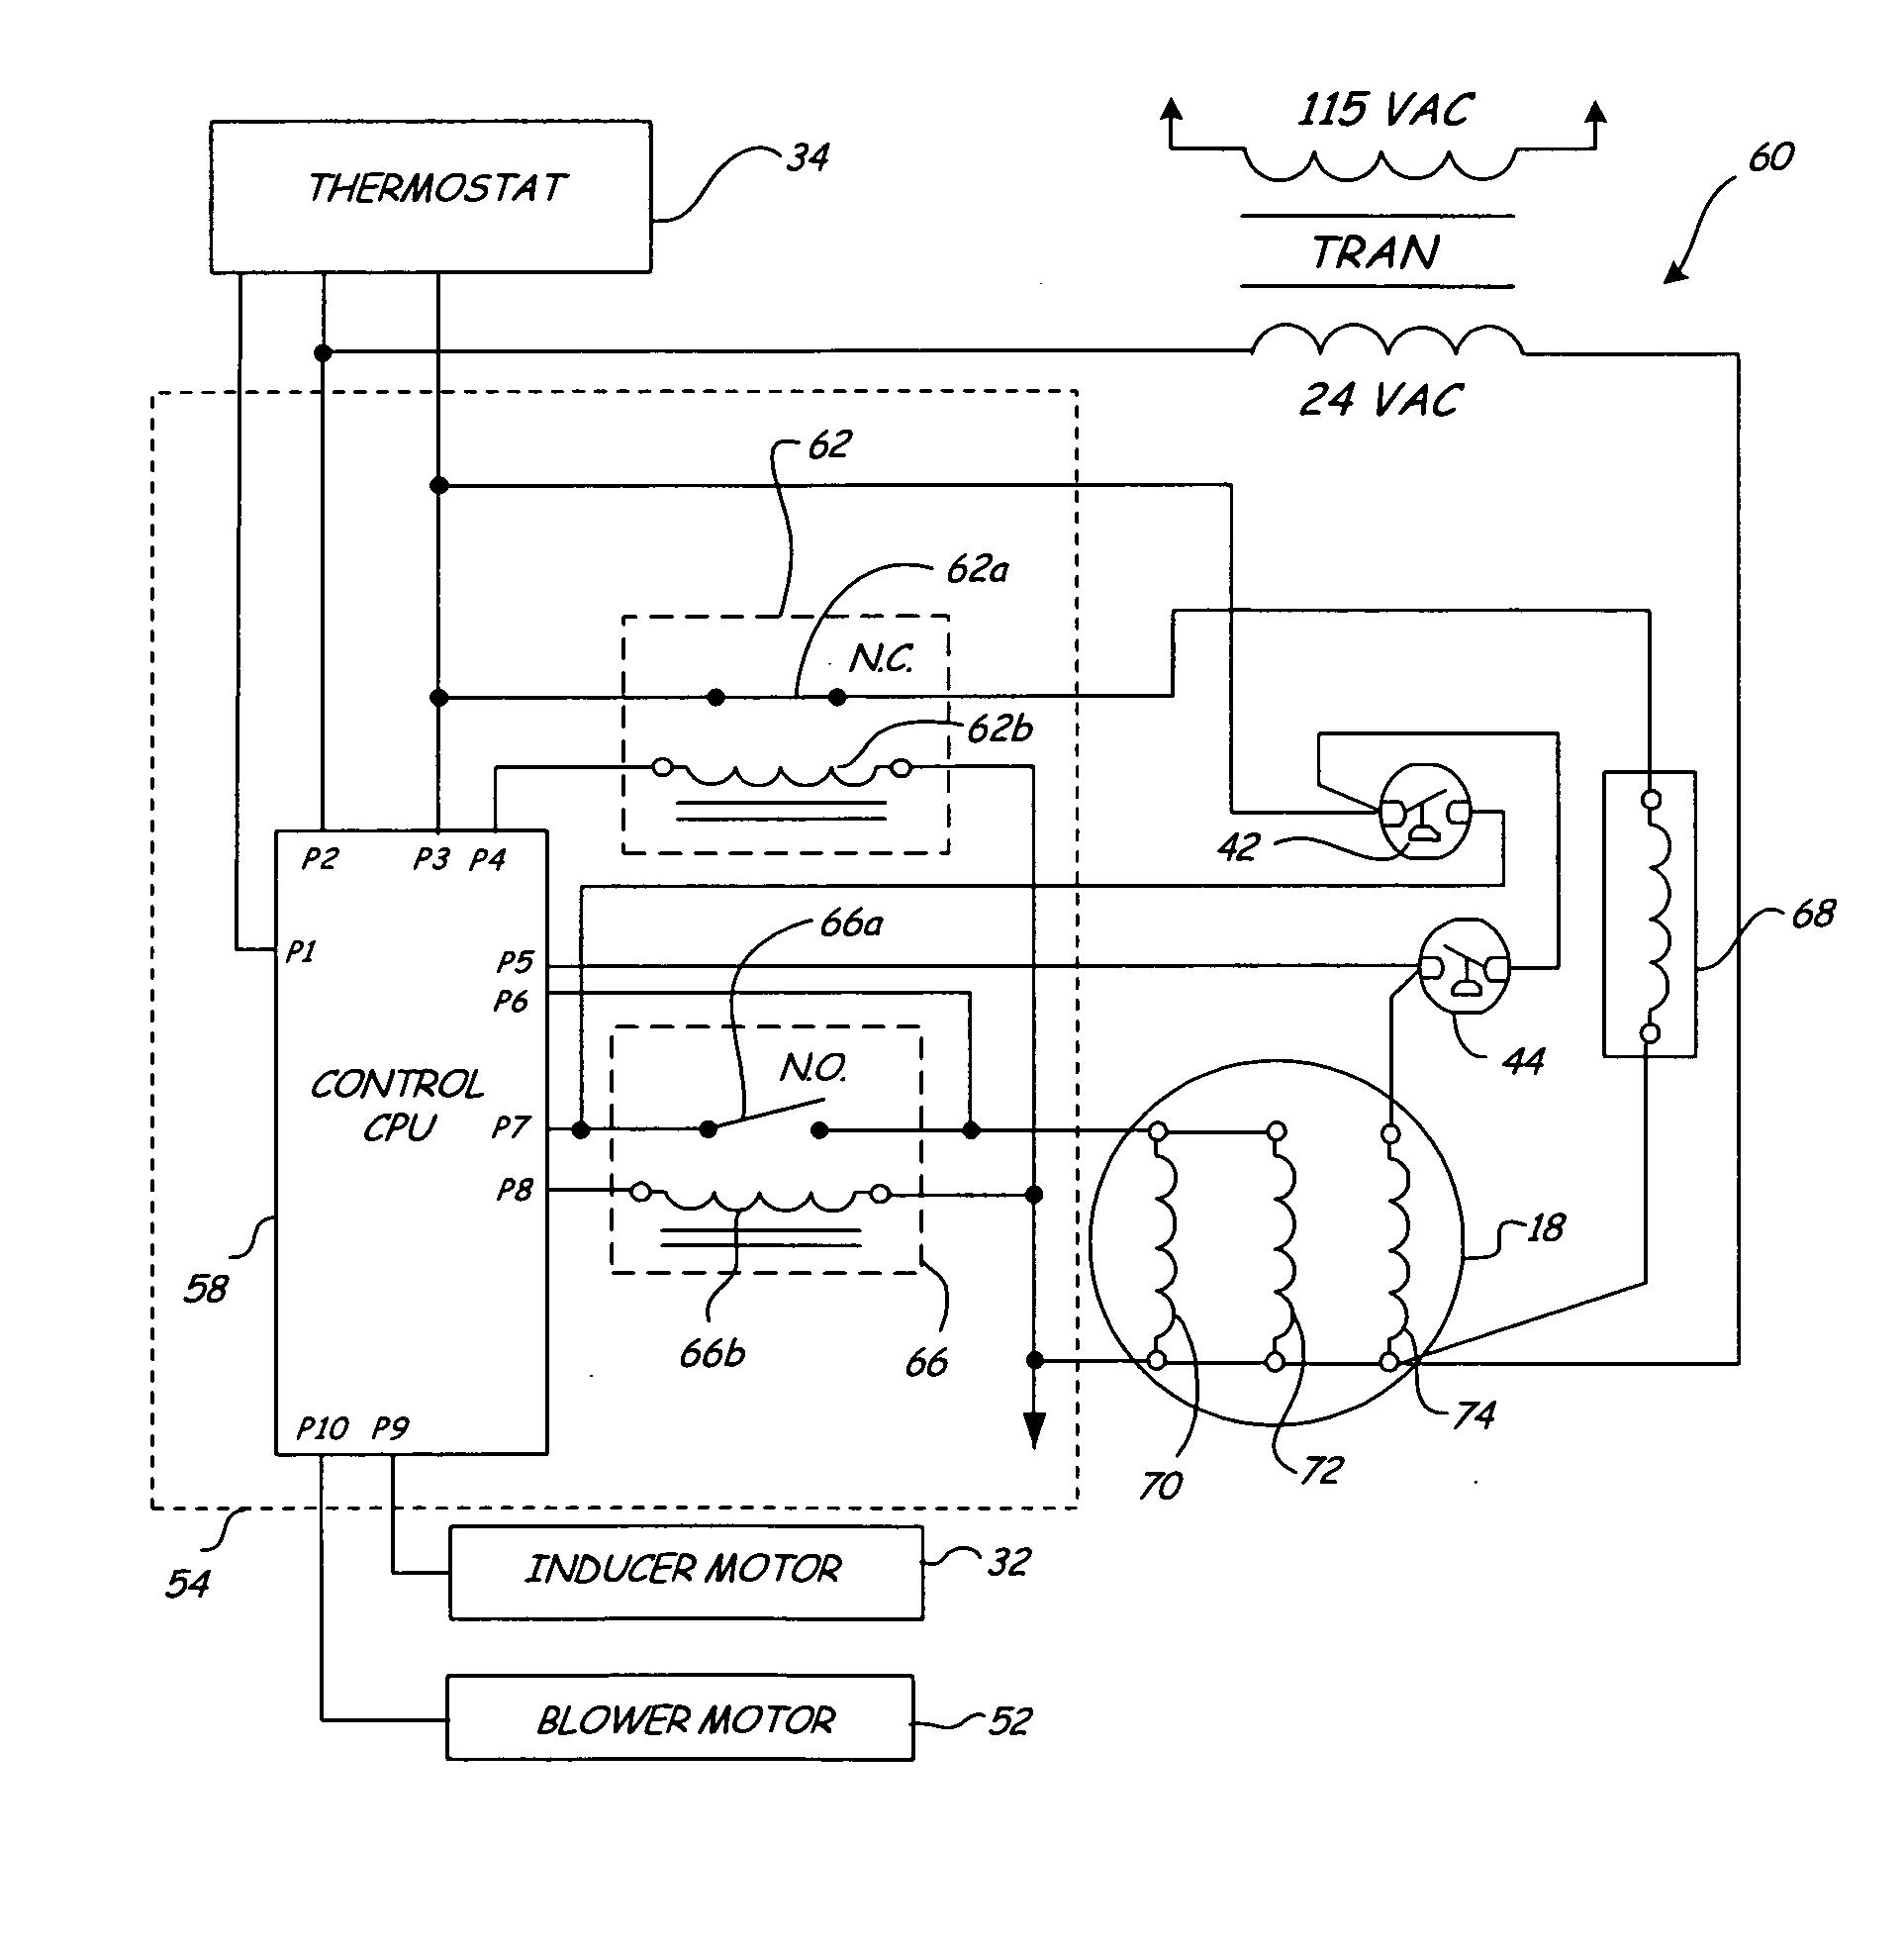 US20080127963A1 20080605 D00000?resize\=665%2C680 ptc heater wiring diagram dell wiring diagram, hewlett packard dayton unit heater wiring diagram at gsmx.co